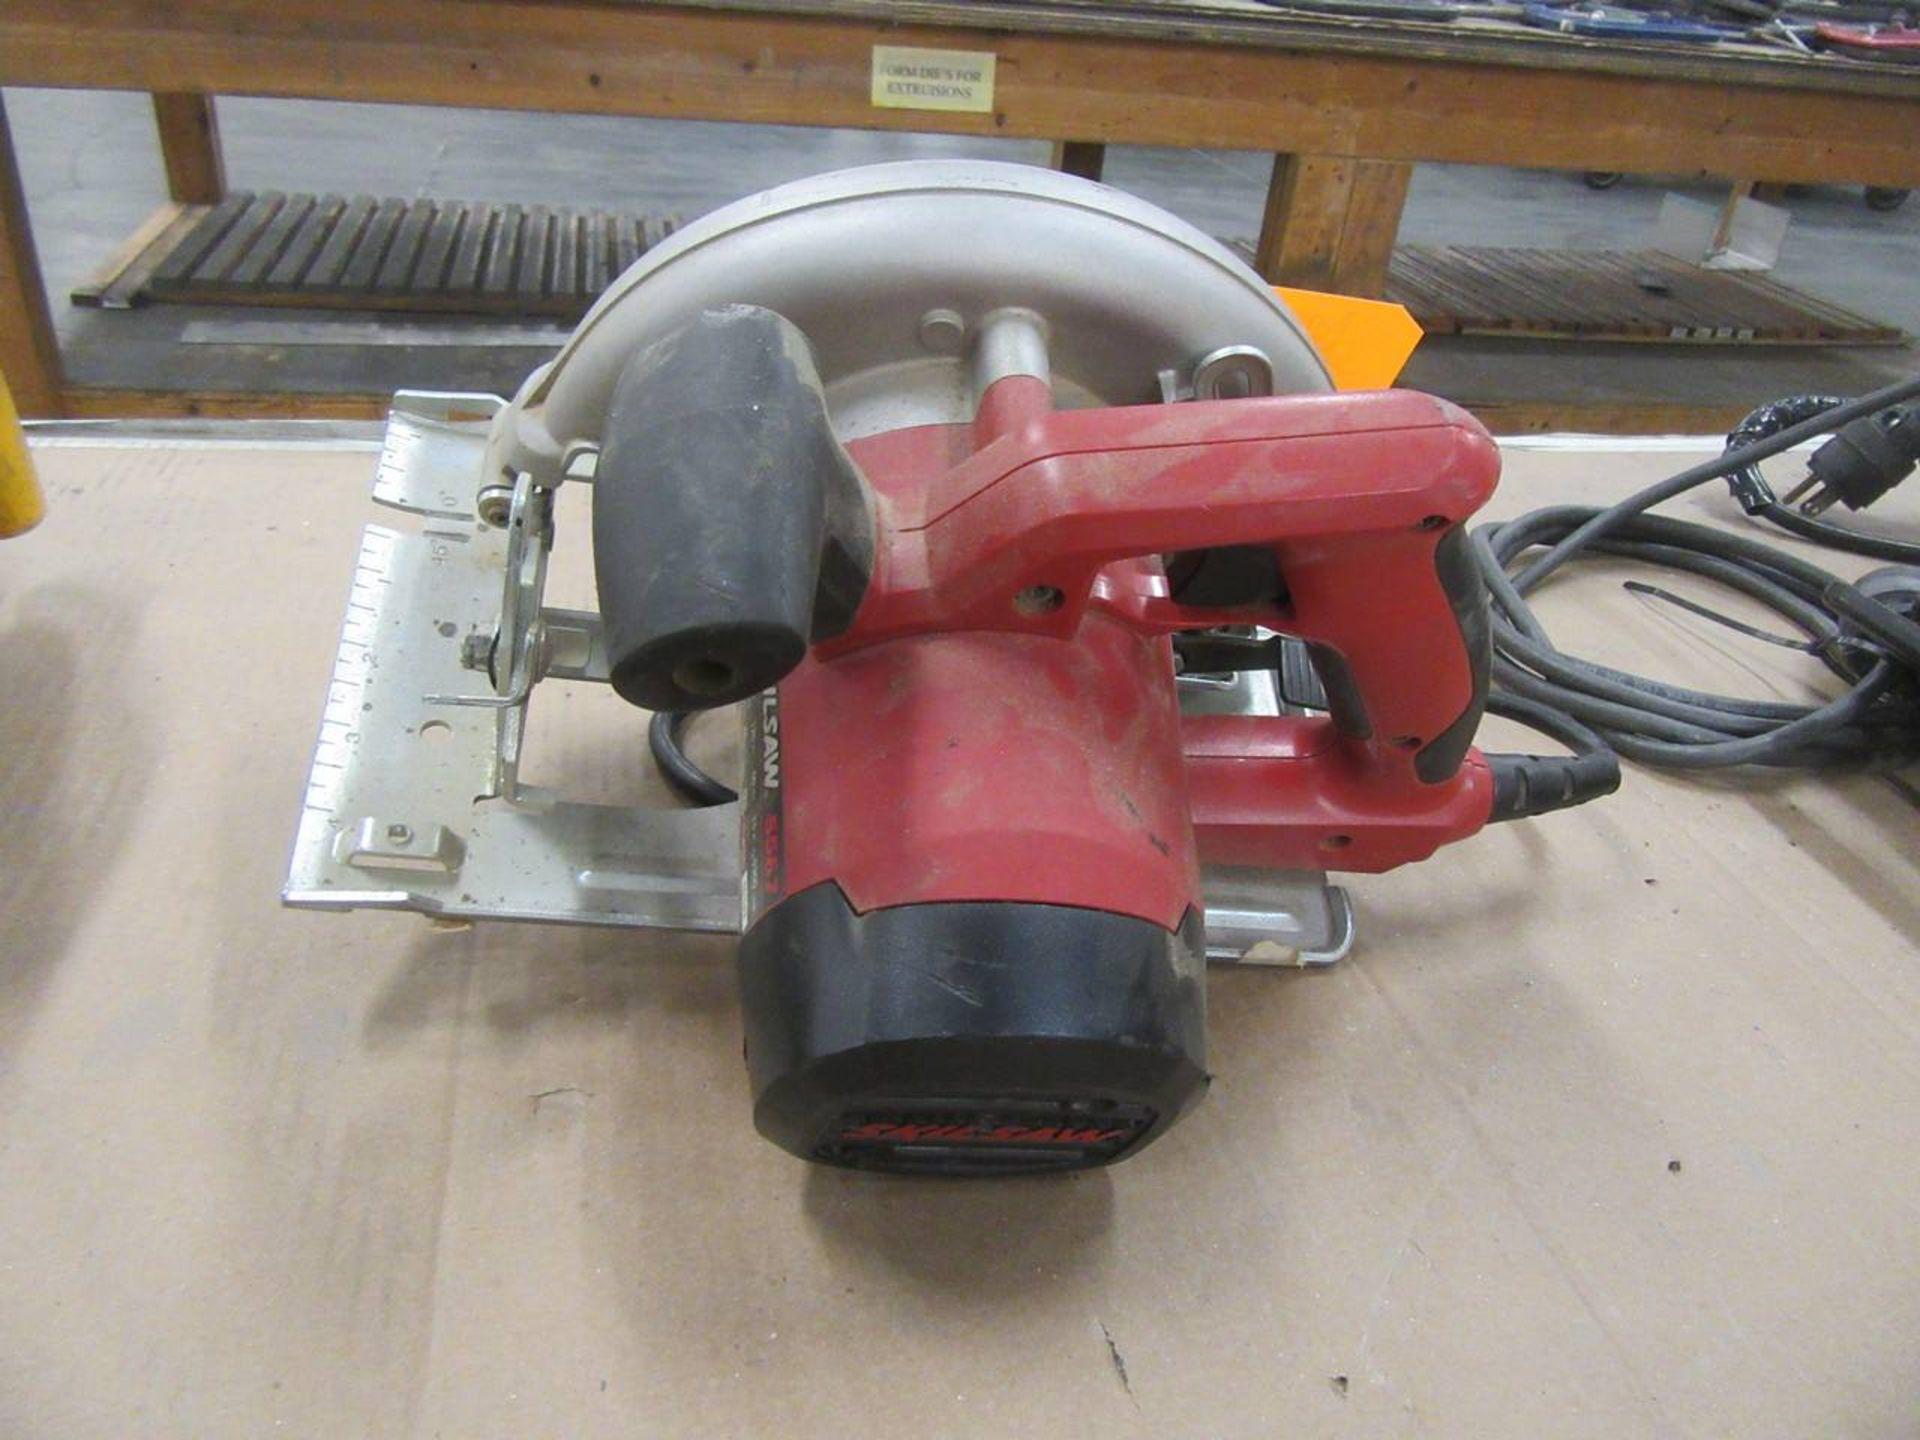 Skilsaw 5587 Circular Saw - Image 2 of 2